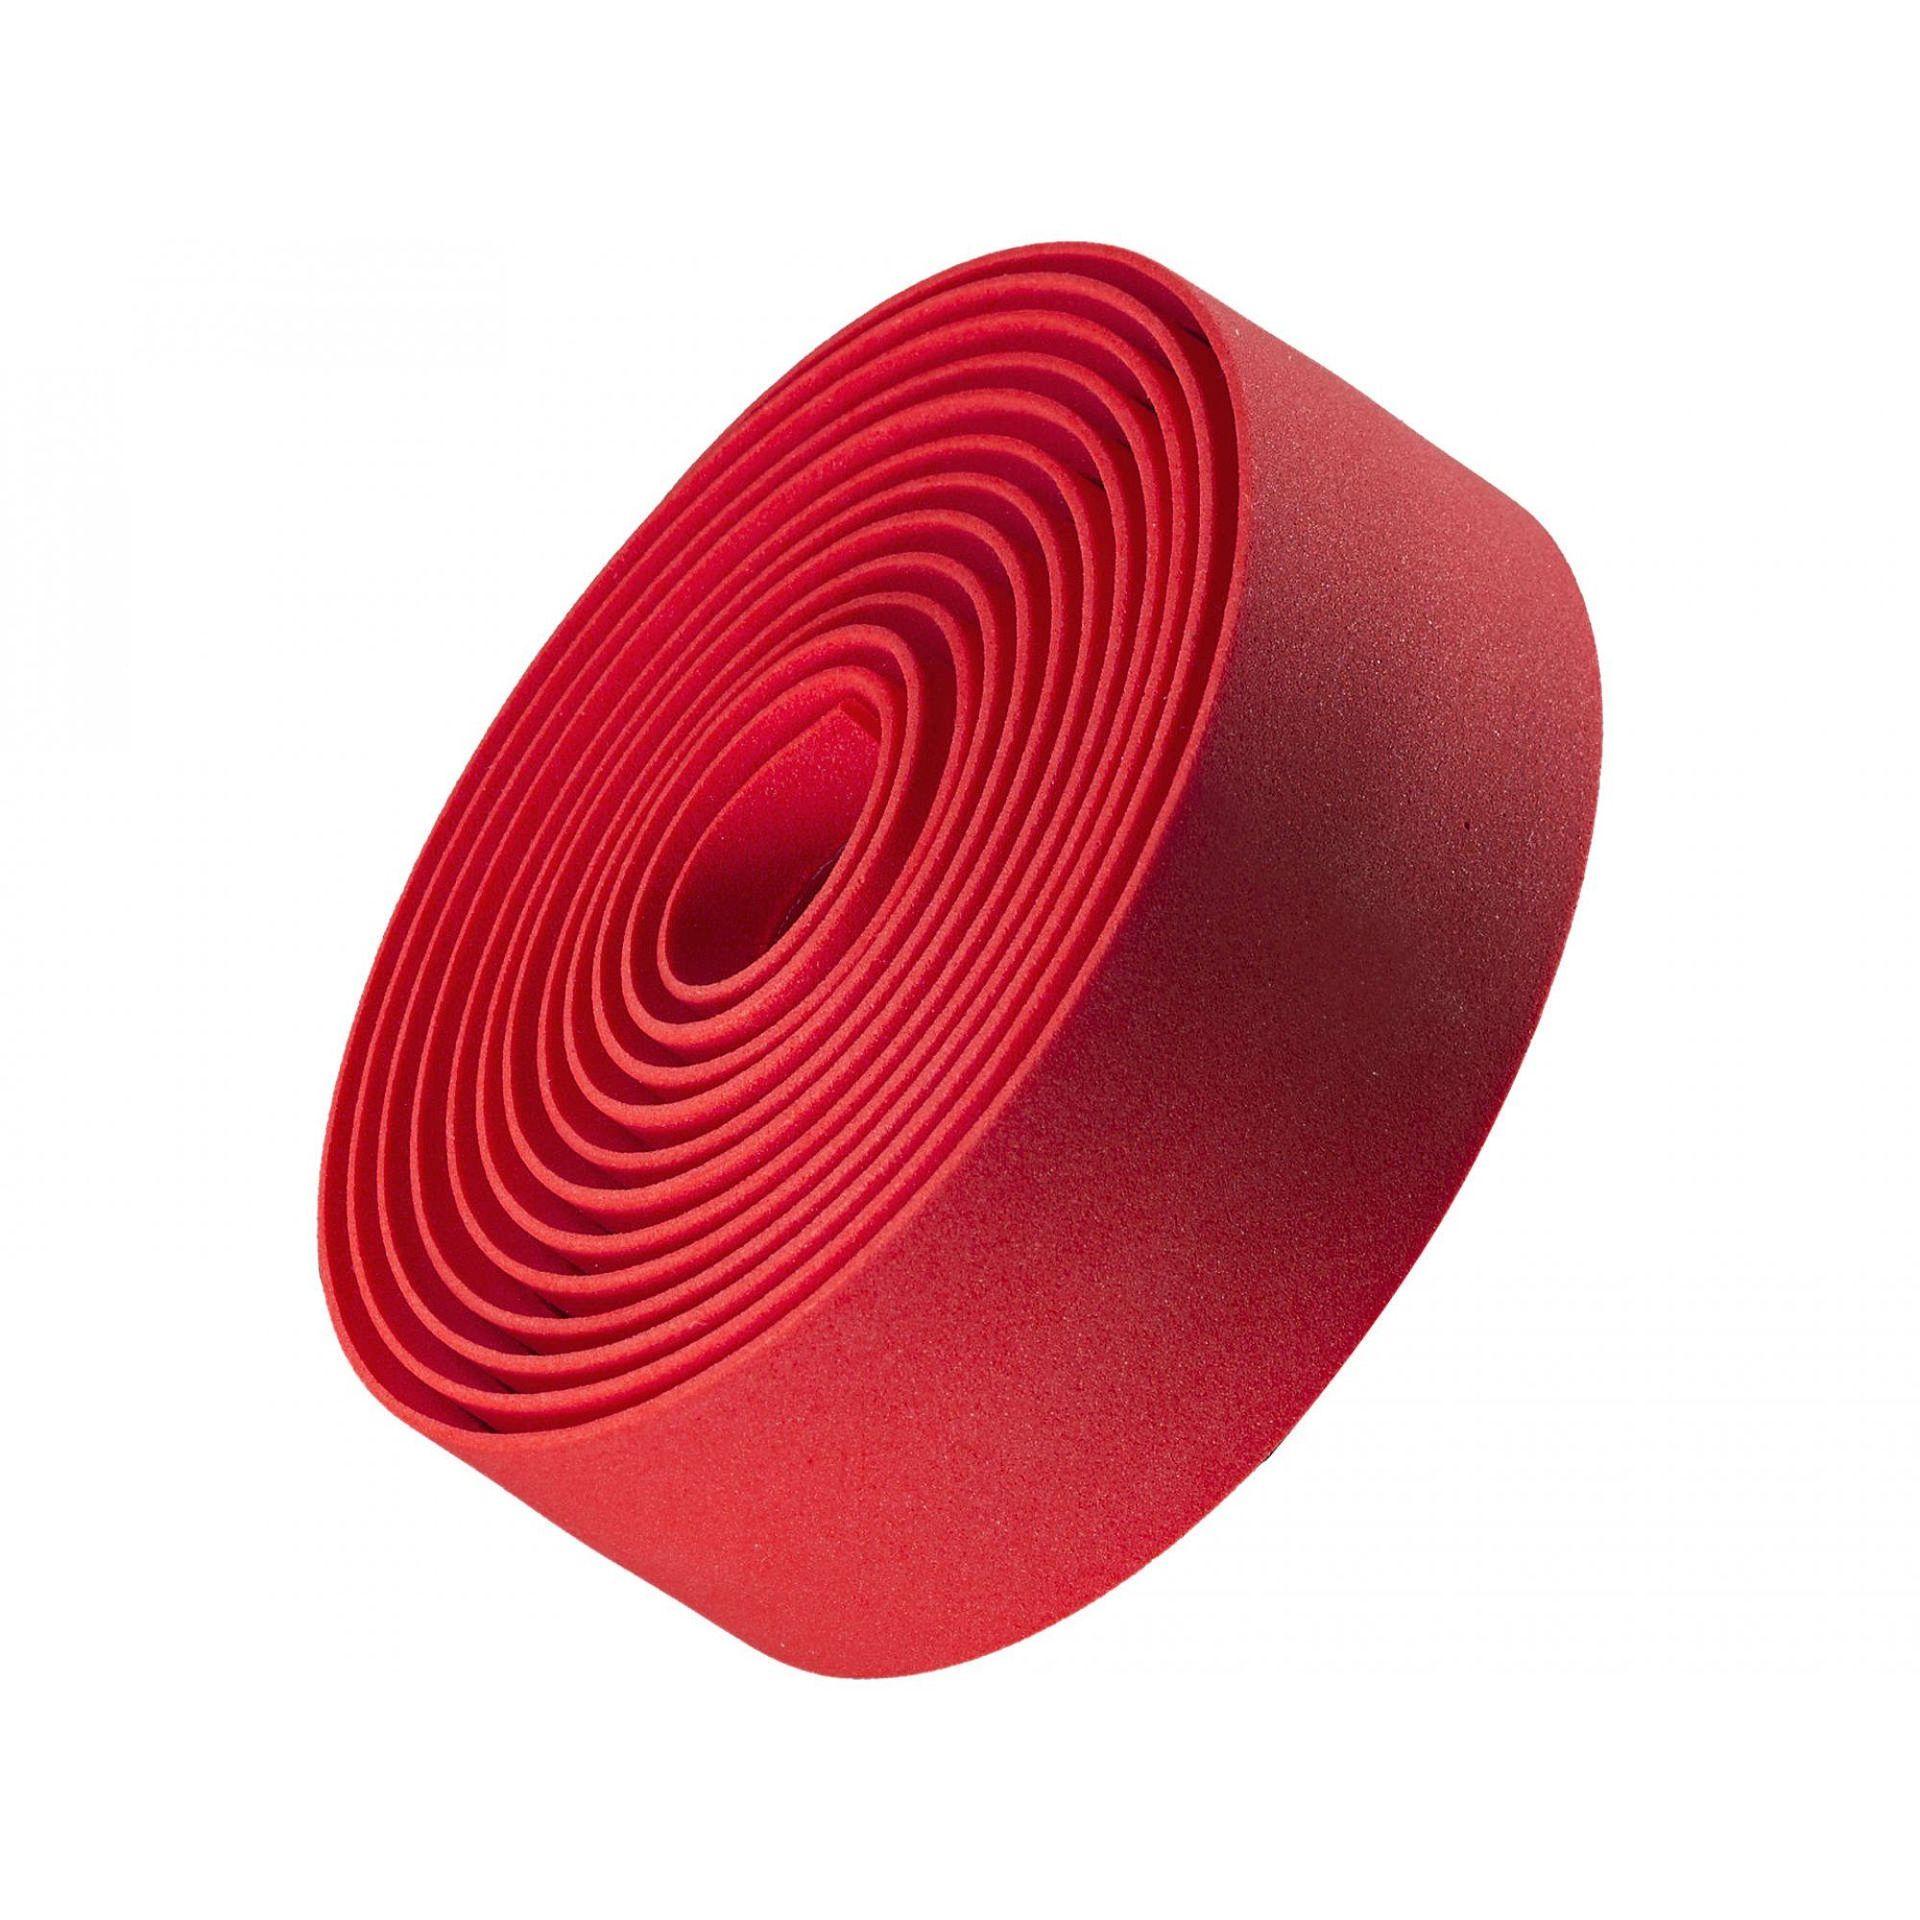 OWIJKA ROWEROWA BONTRAGER GEL CORK VIPER RED